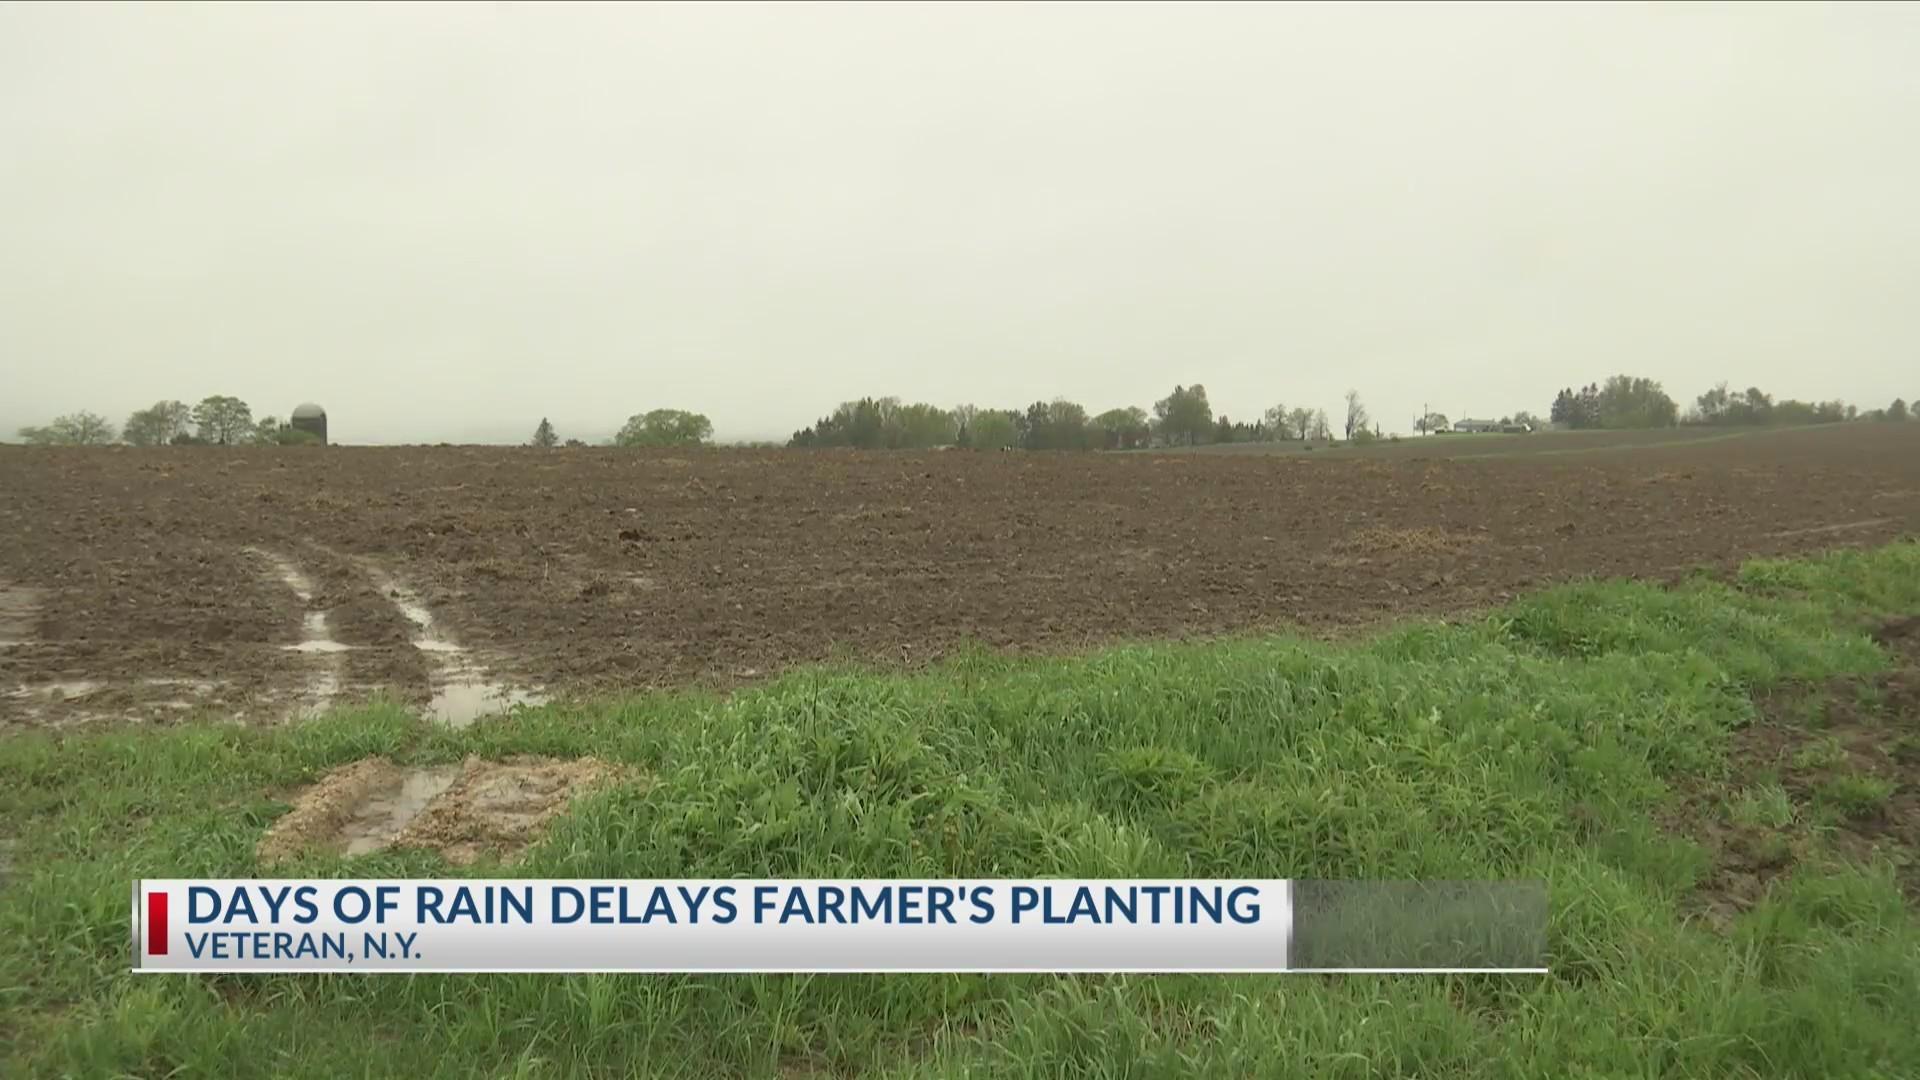 Farmer_s_crop_planting_keeps_being_delay_0_20190513230504